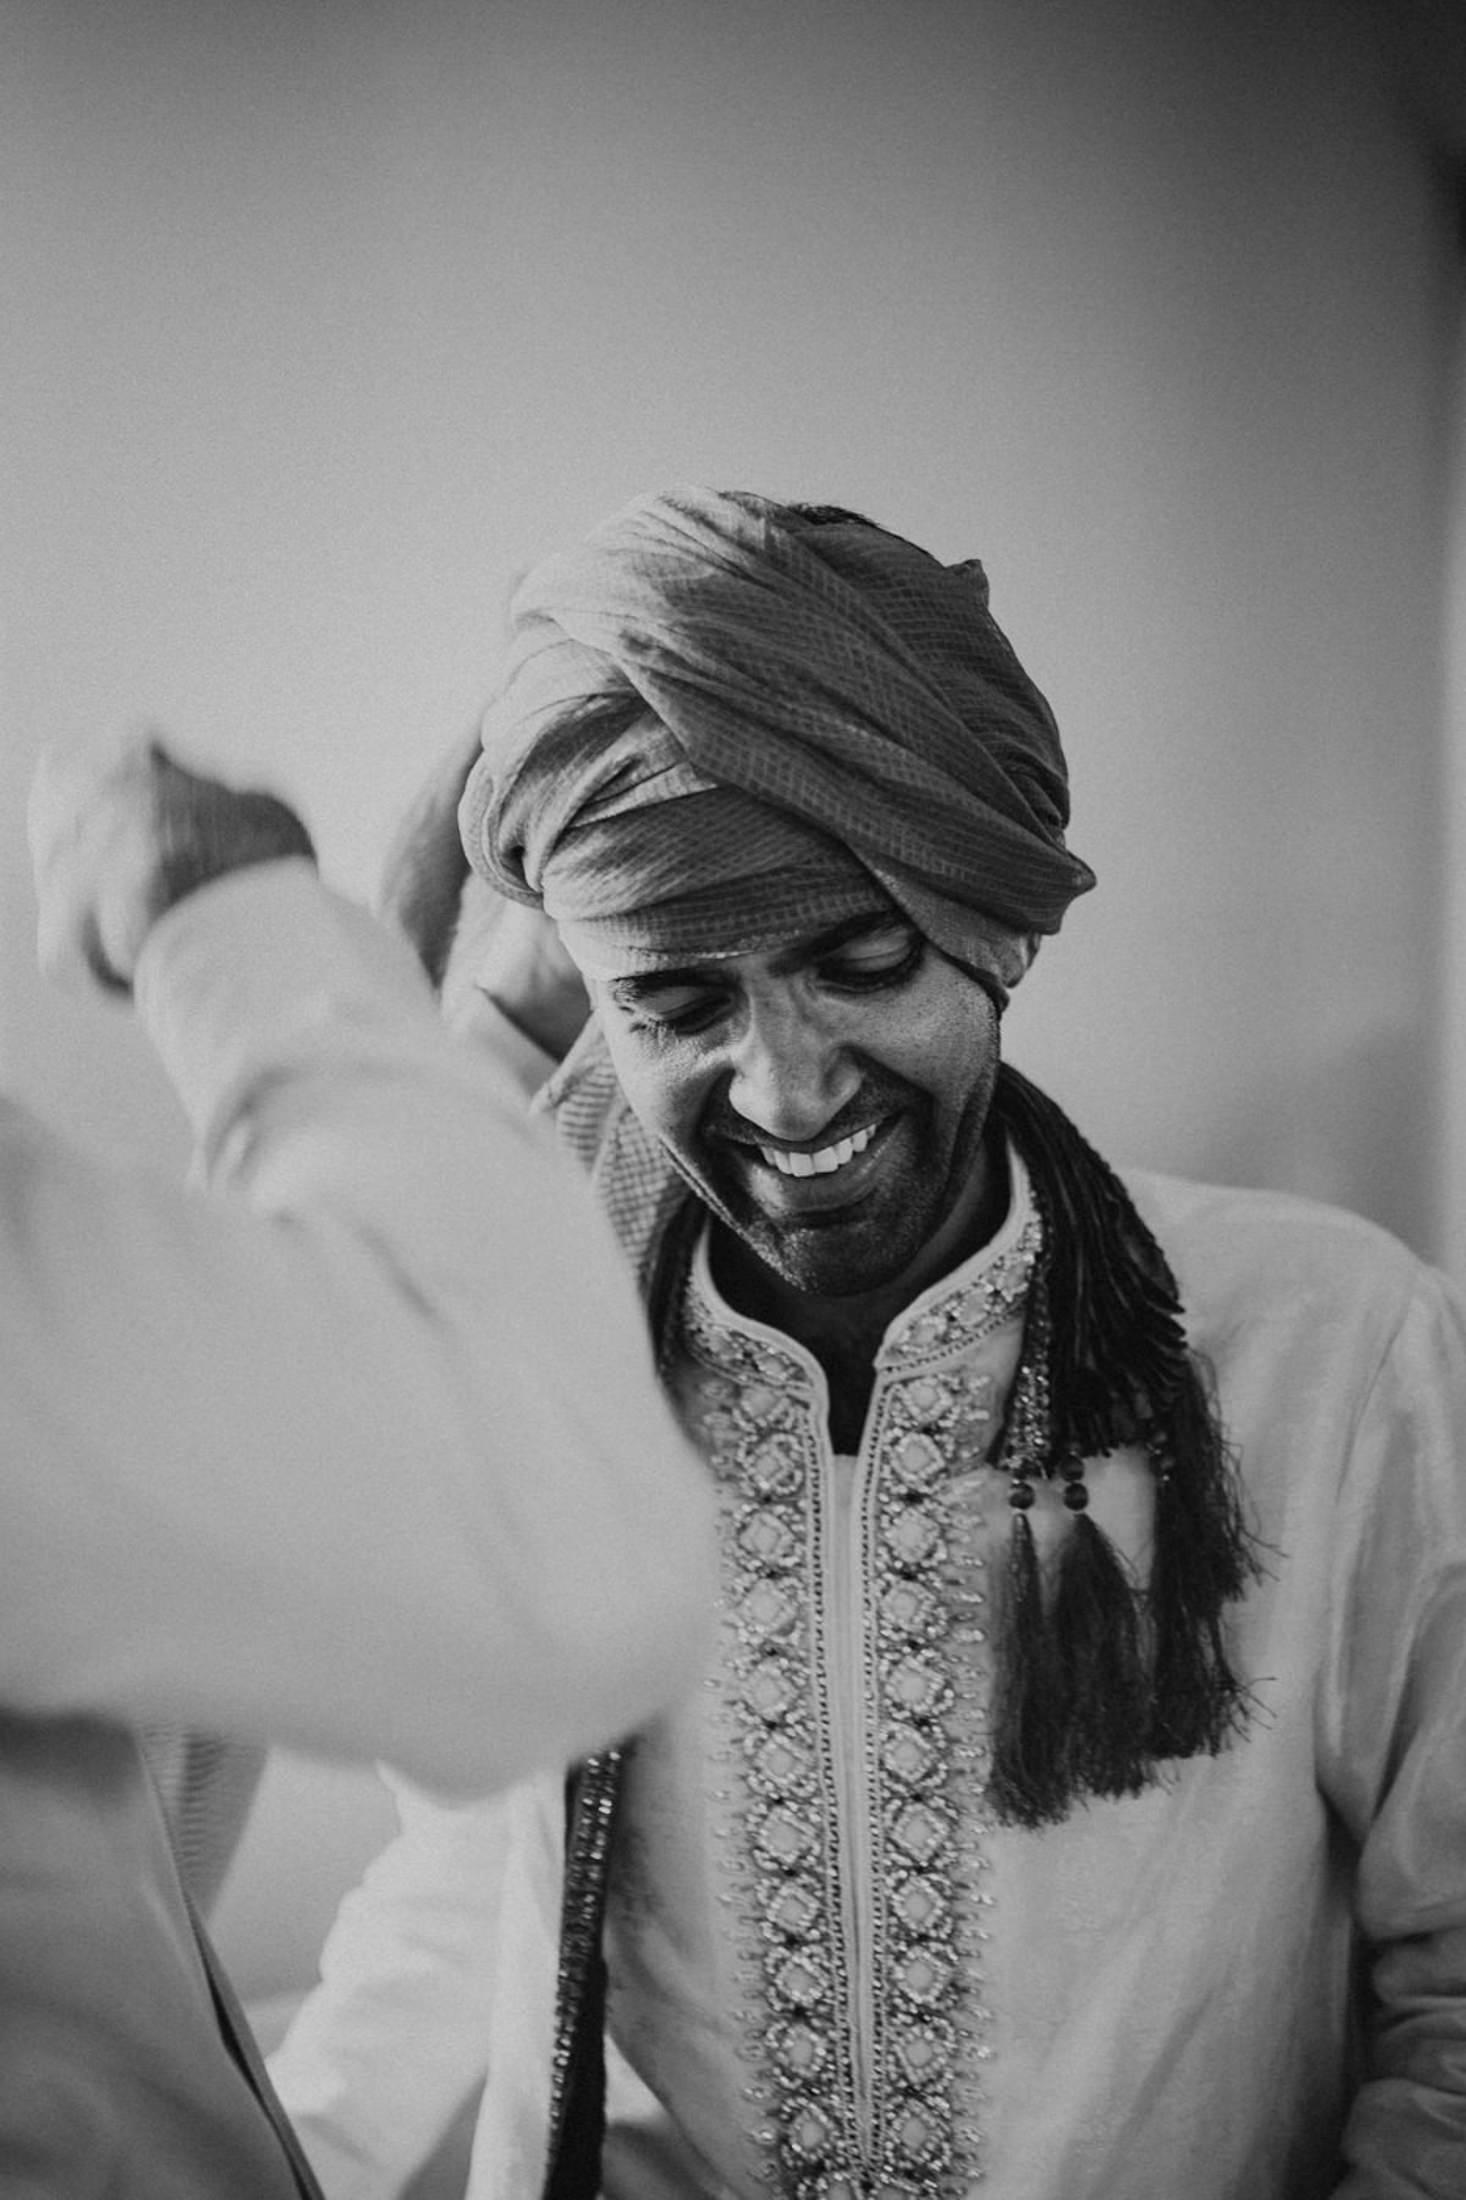 Wedding_Photographer_Mallorca_Daniela-Marquardt_Photography_New_York_Iceland_Tuscany_Santorini_Portugal_Austria_Bavaria_Elopement_Hochzeitsfotograf_AntjeRajat2_23